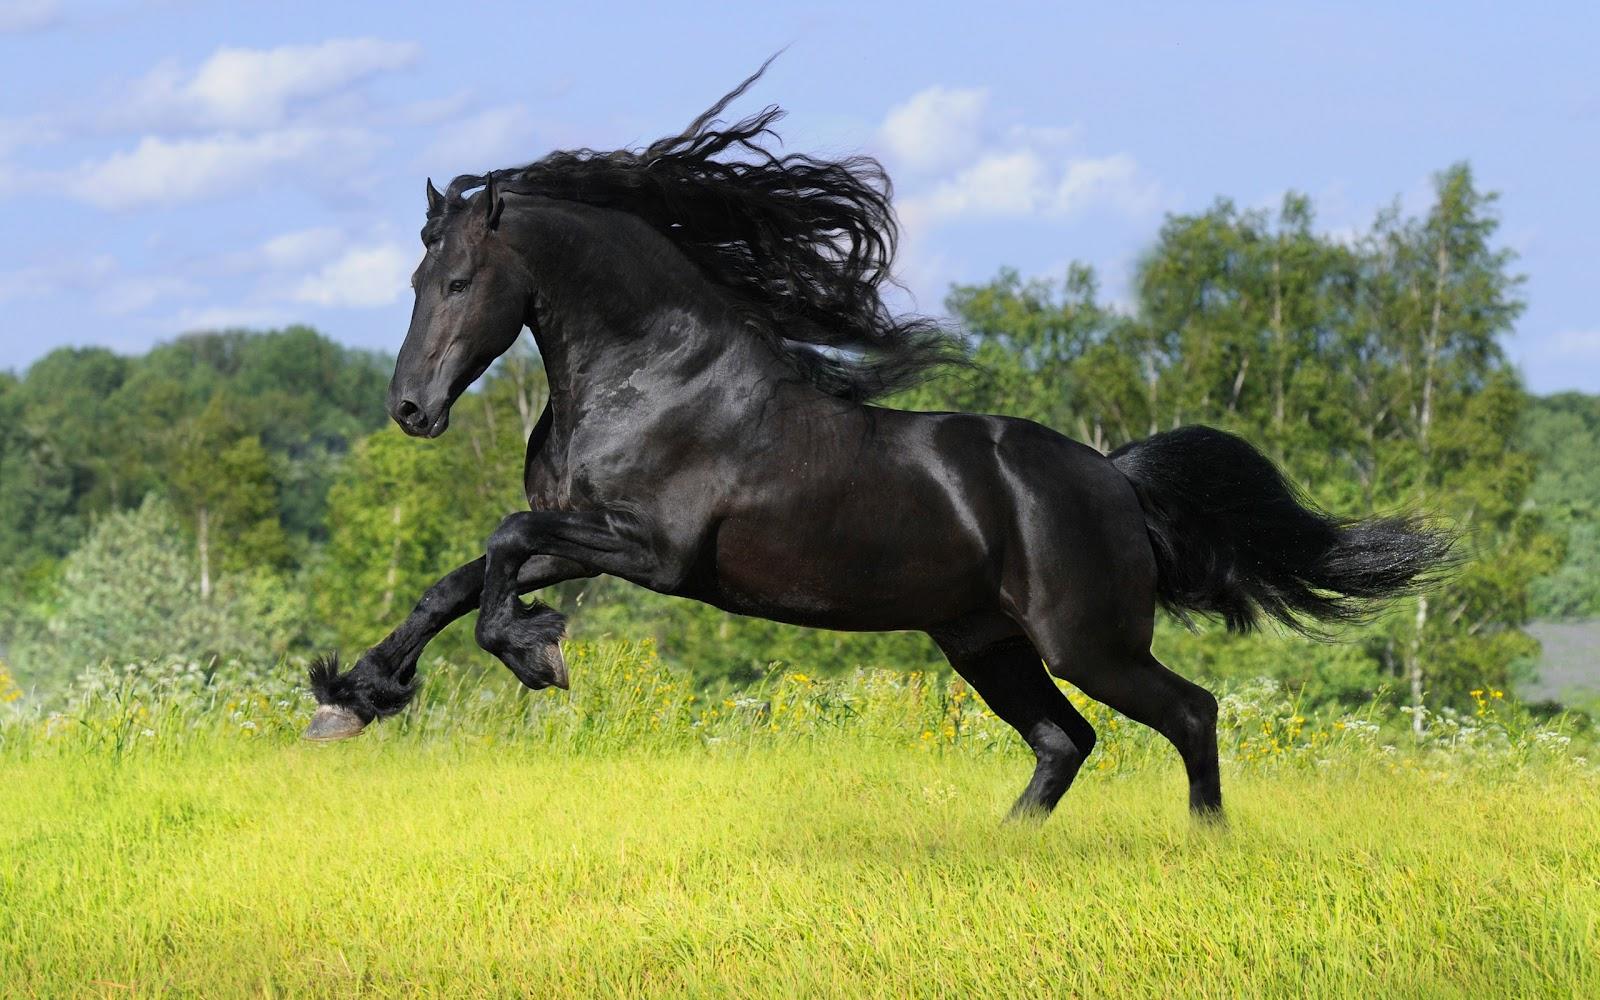 horse wallpaper arabian horse wallpaper beautiful horse wallpaper 1600x1000